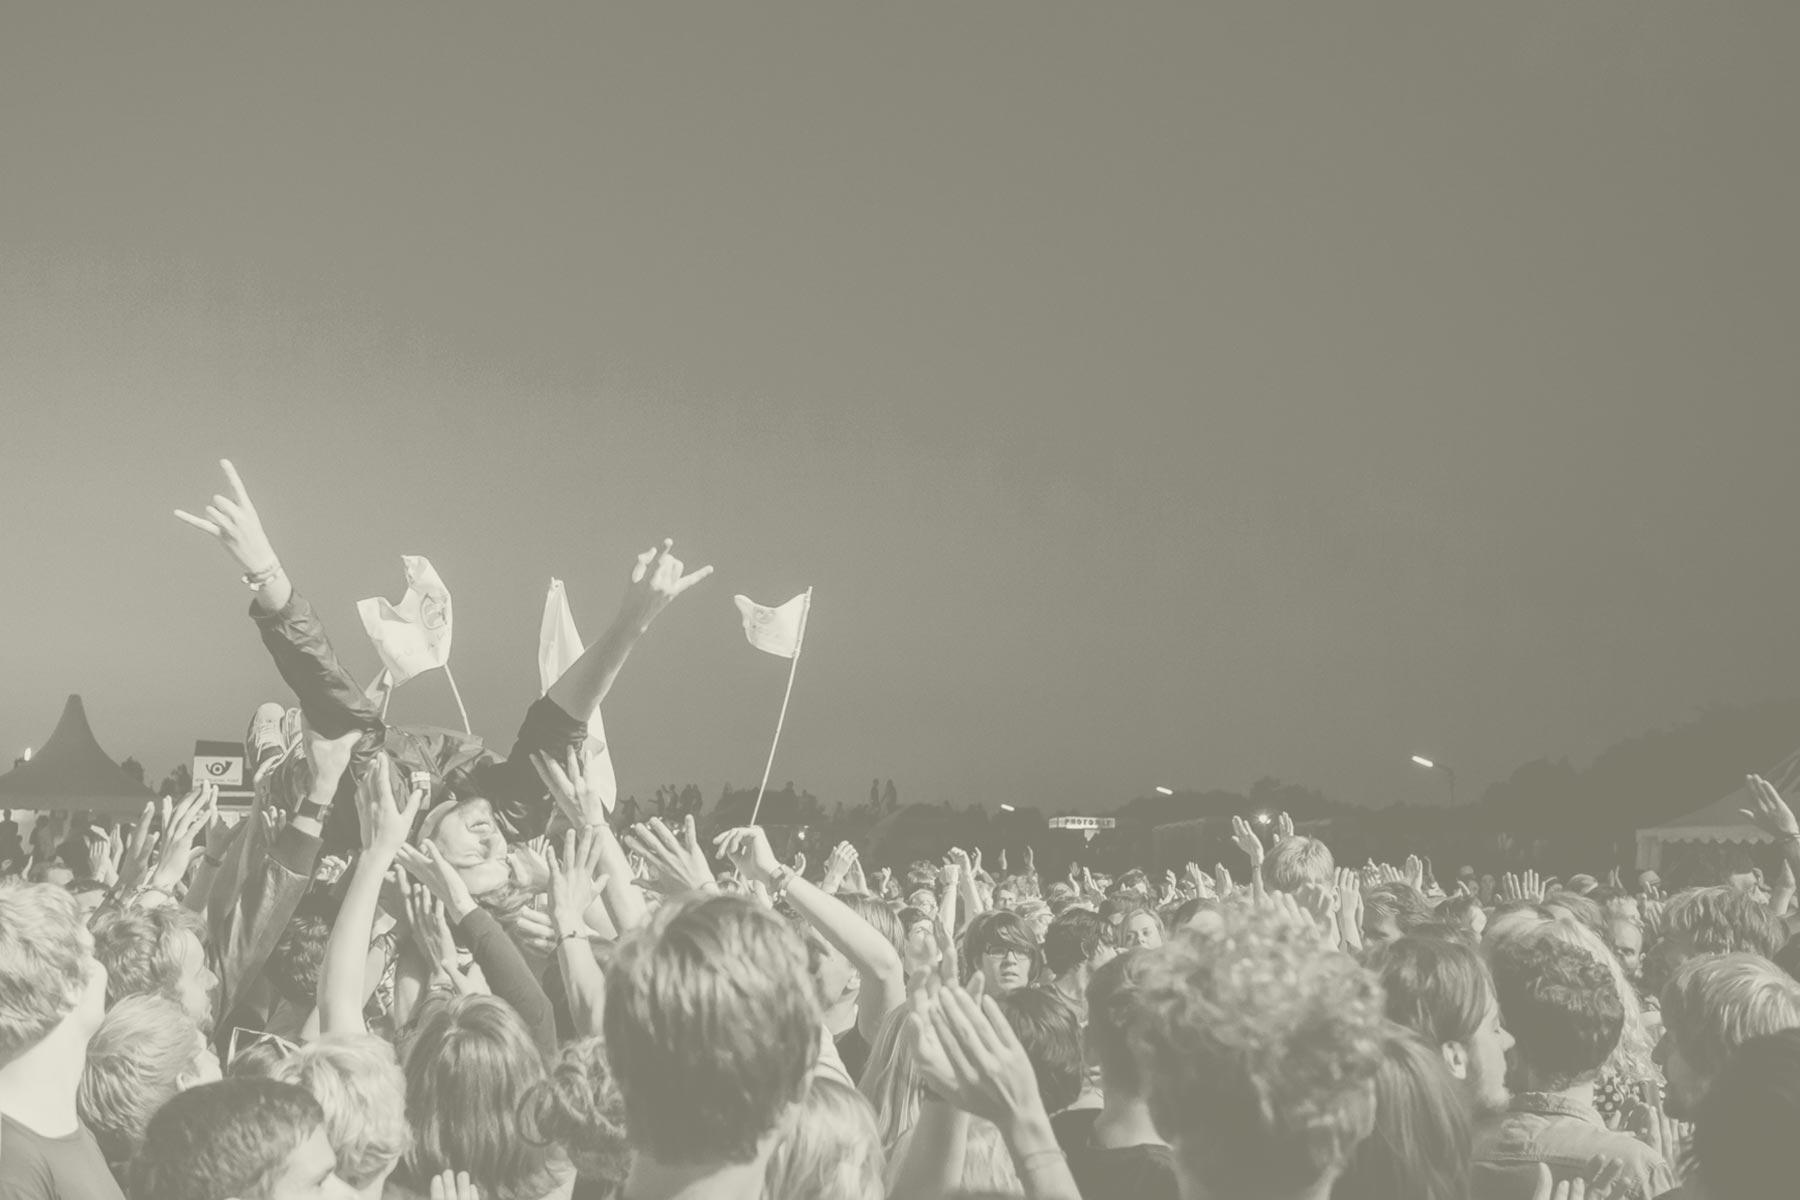 bg-crowdsurfing